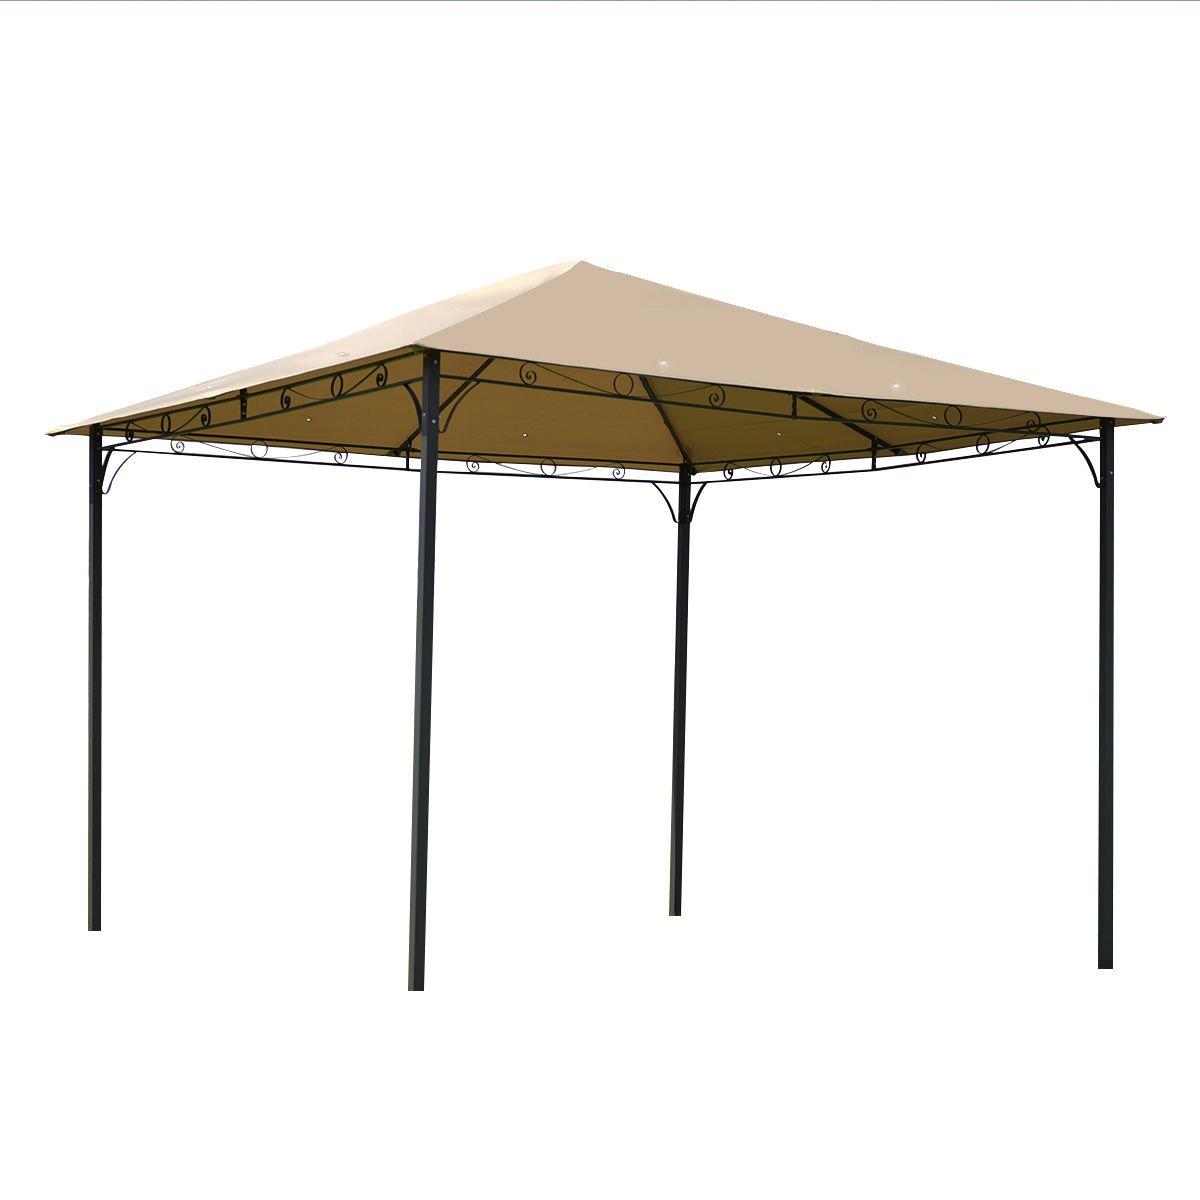 Outdoor 10'x10' Square Gazebo Canopy Tent Shelter Awning Garden Patio Tan + FREE E-Book